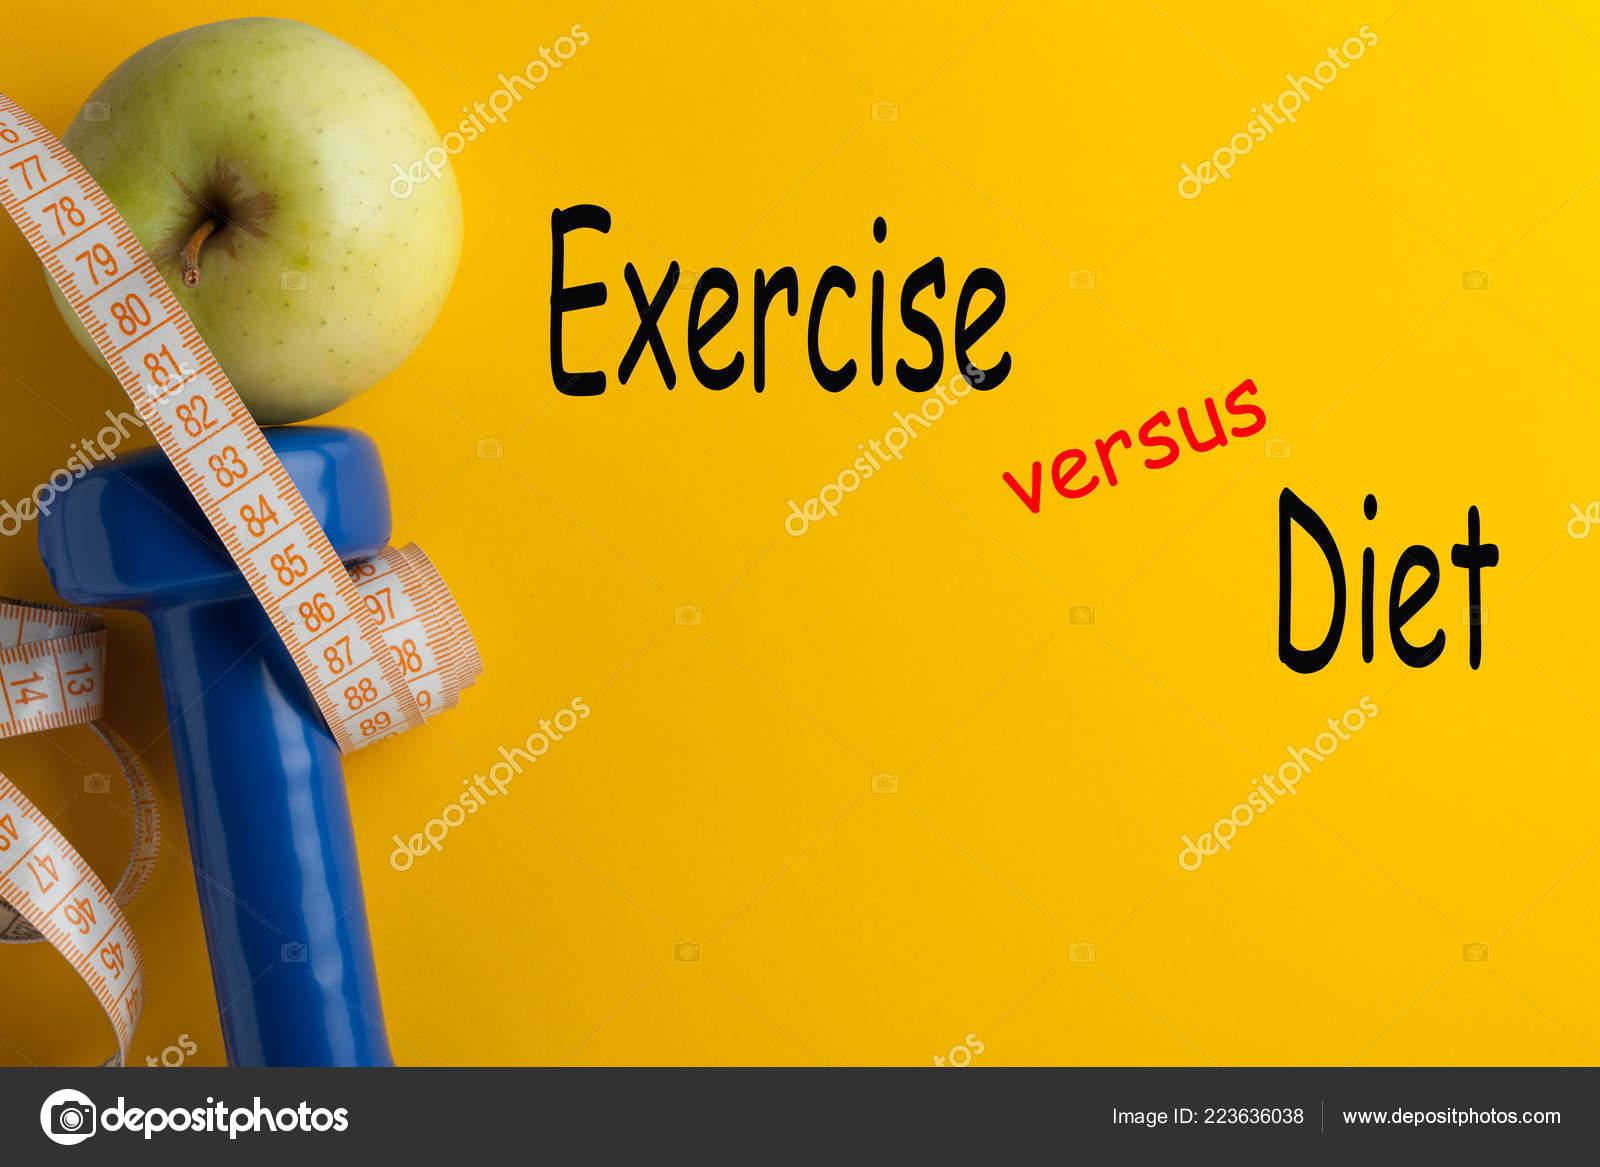 Ejercicios Dieta Para Bajar Peso Cita Aptitud Motivacional